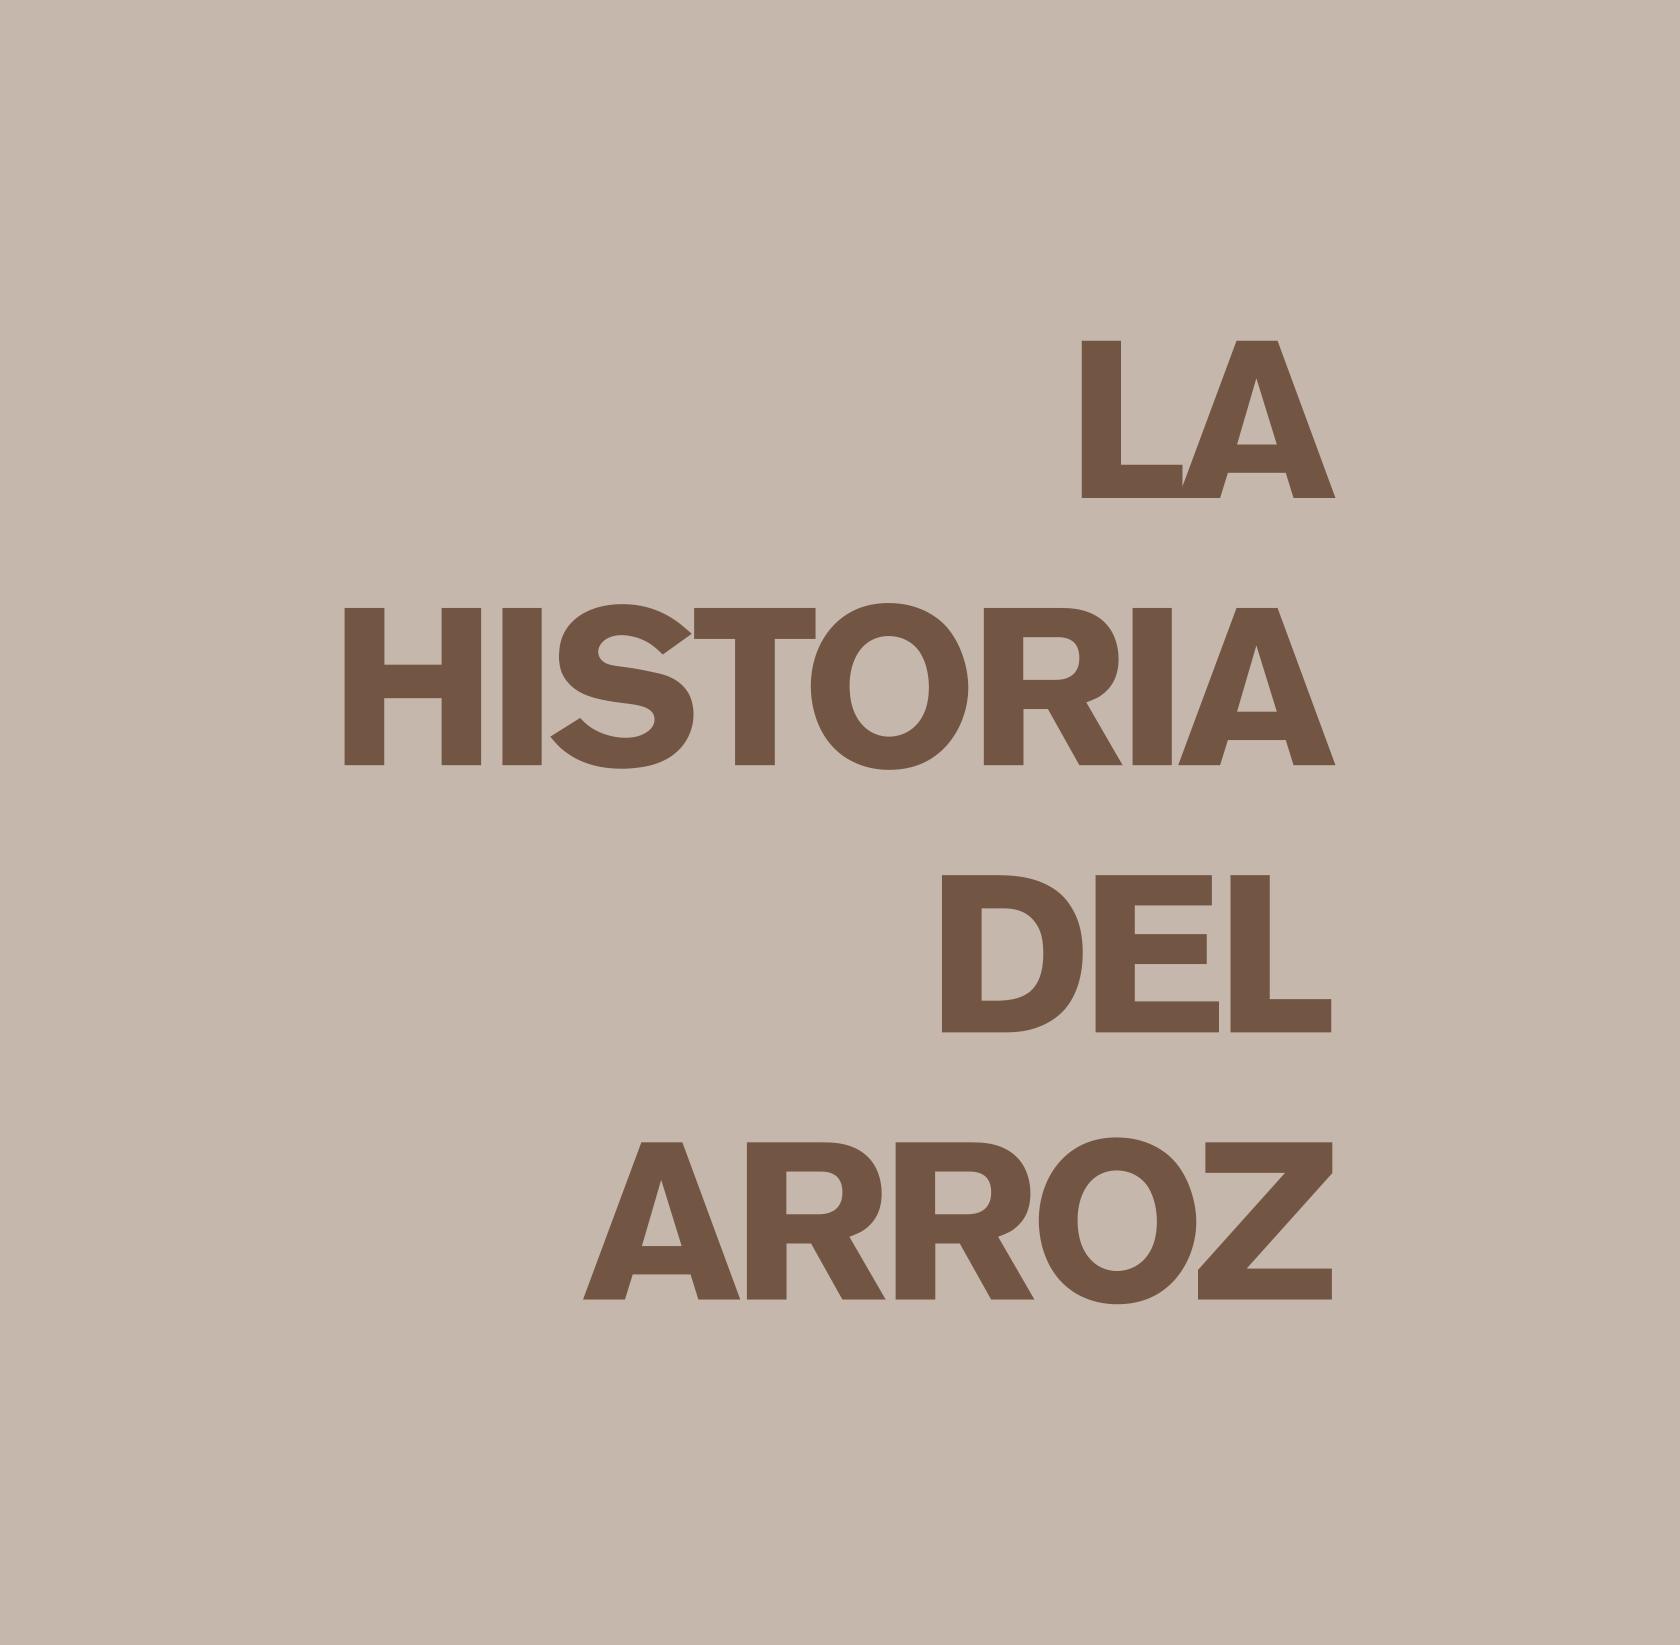 Historia_01